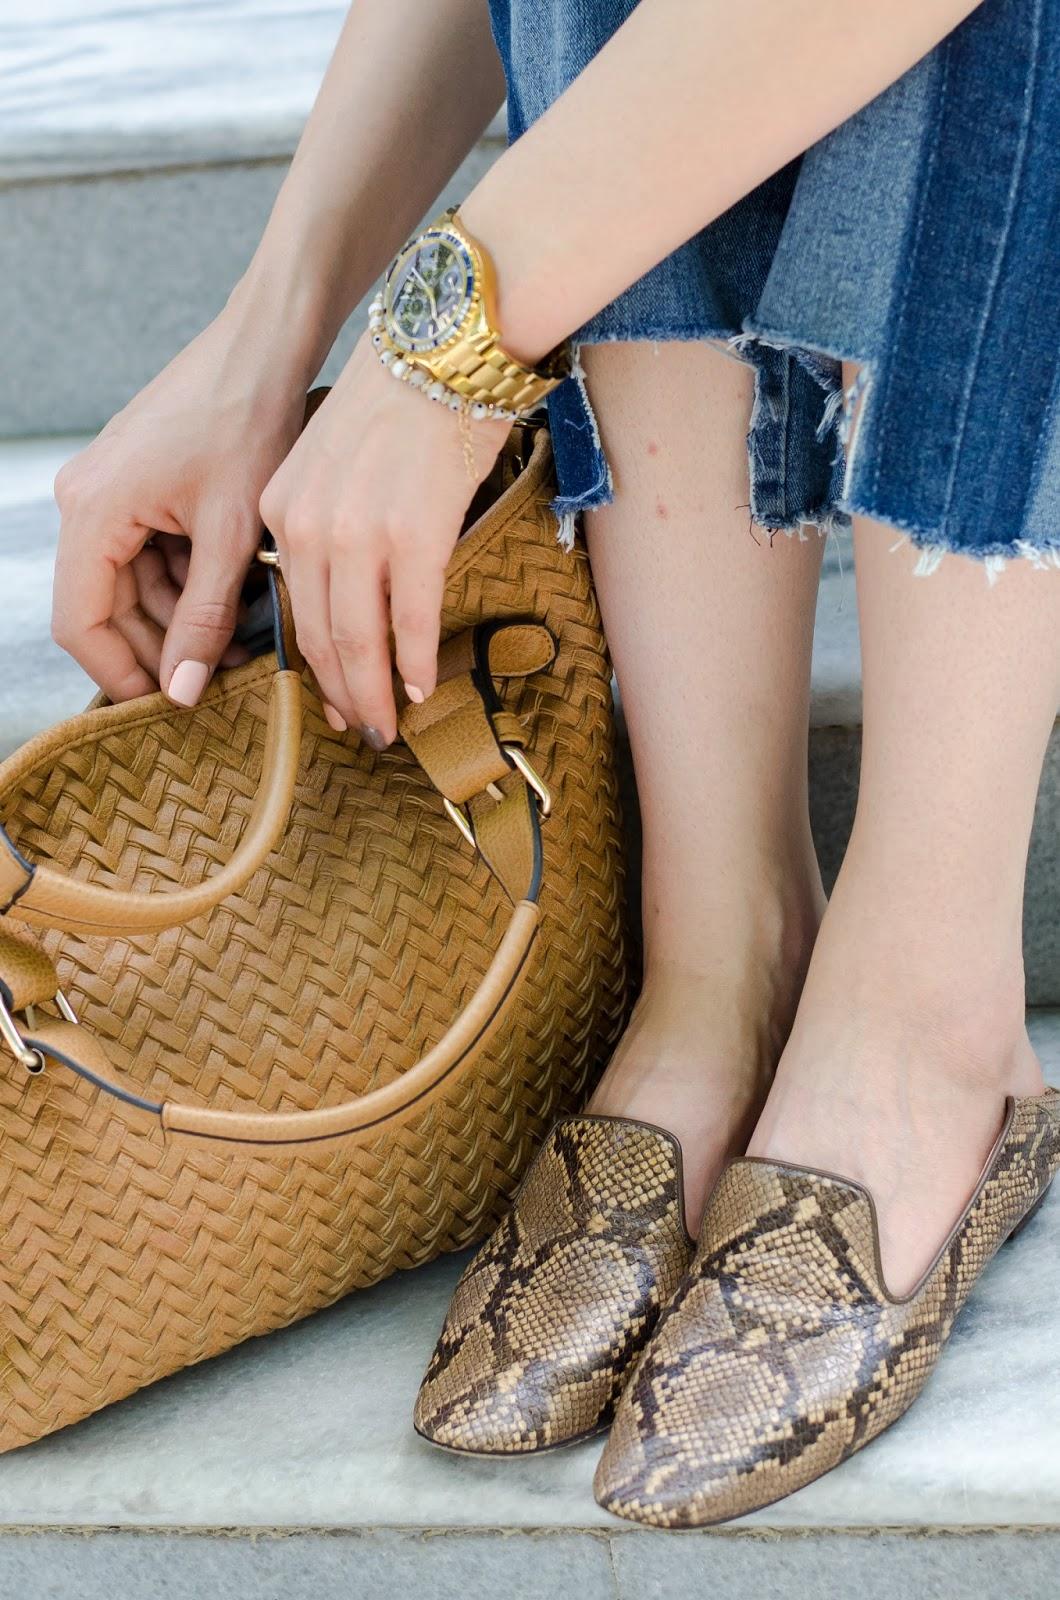 fashion blogger diyorasnotes diyora beta white t-shirt mom jeans loafers asos bag straw hat